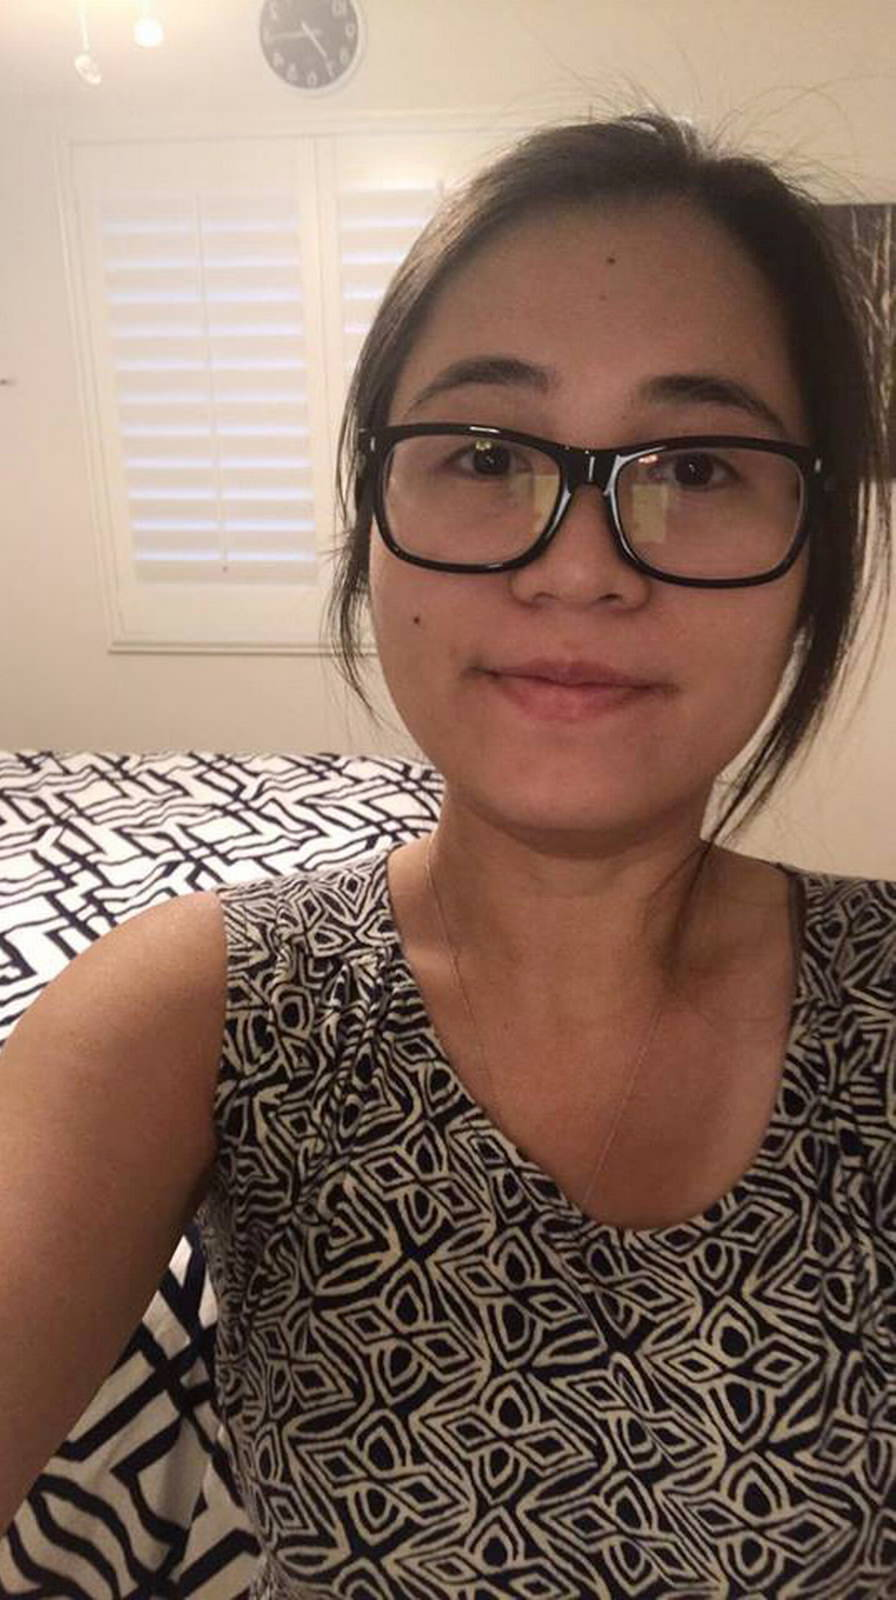 Cewek Cantik Selfie Hot Pamer Toge Ranum Kenyal Bikin Pengen Netek